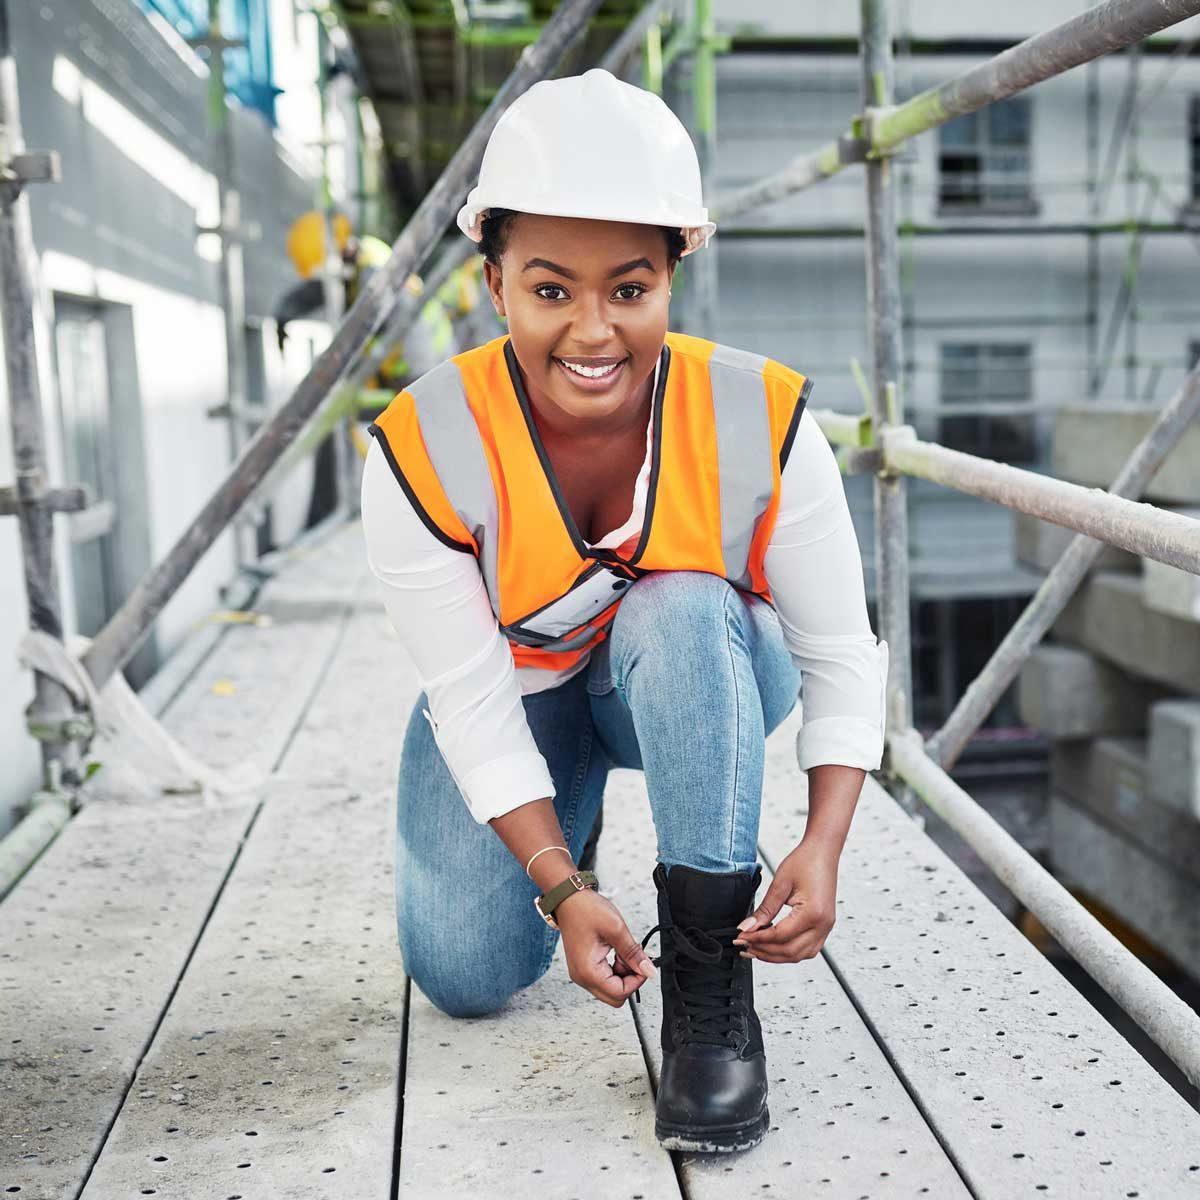 8 Best Women's Work Boots